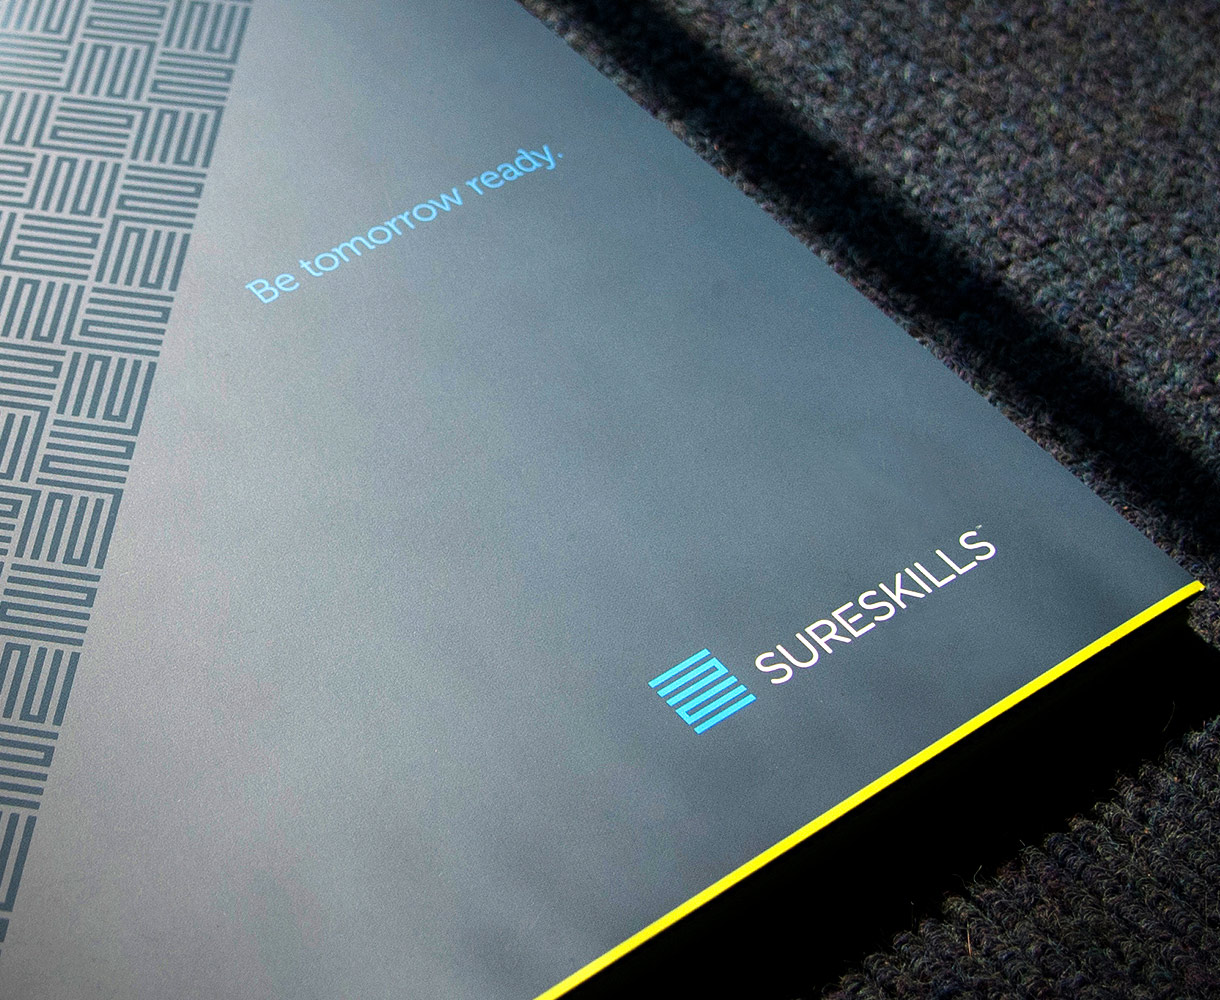 Sureskills Brand Identity Development brochure design